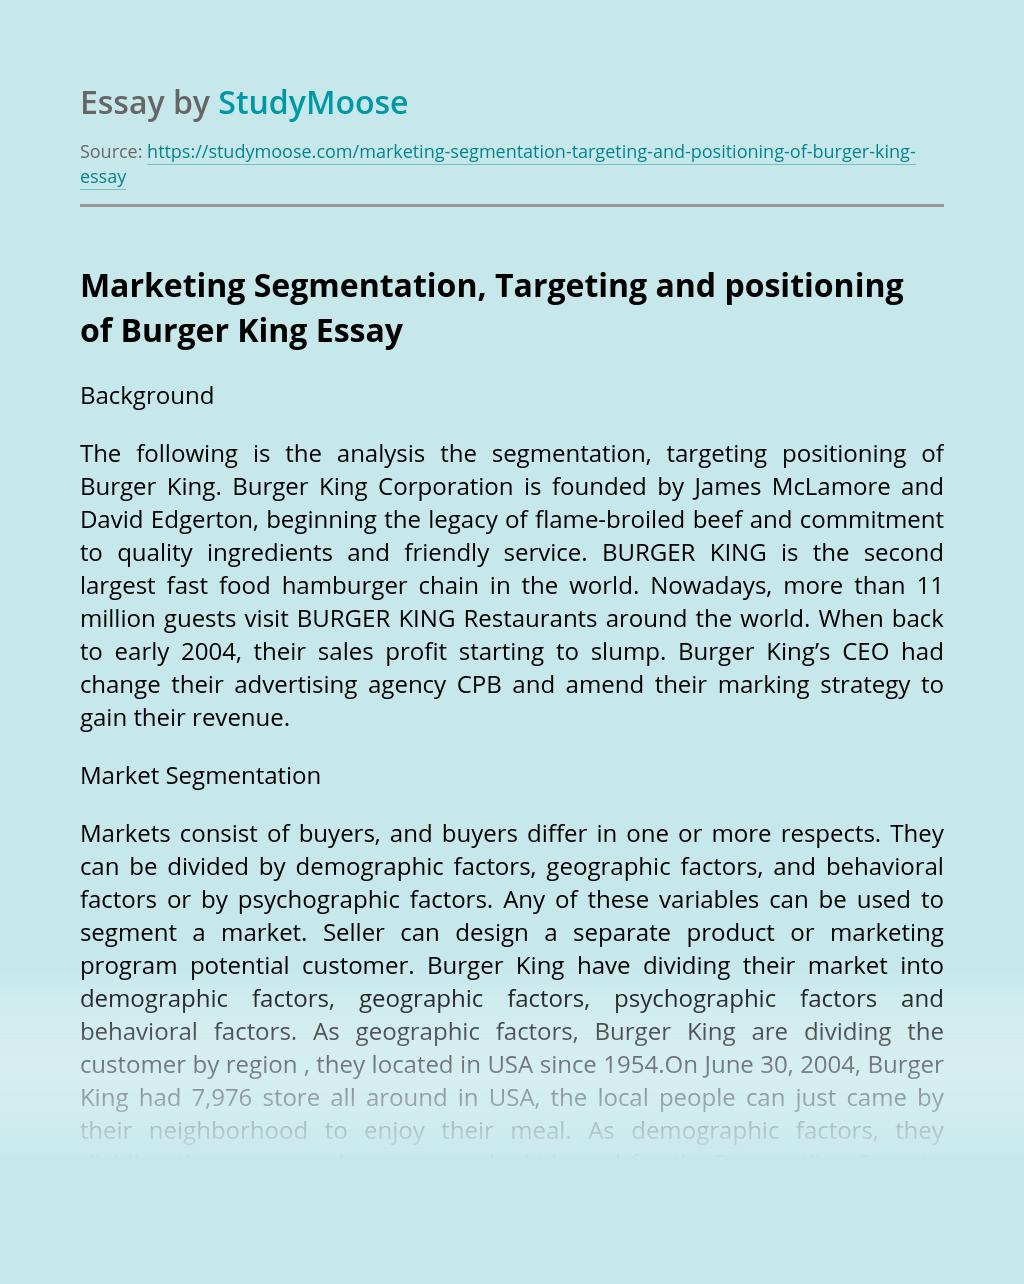 Marketing Segmentation, Targeting and positioning of Burger King